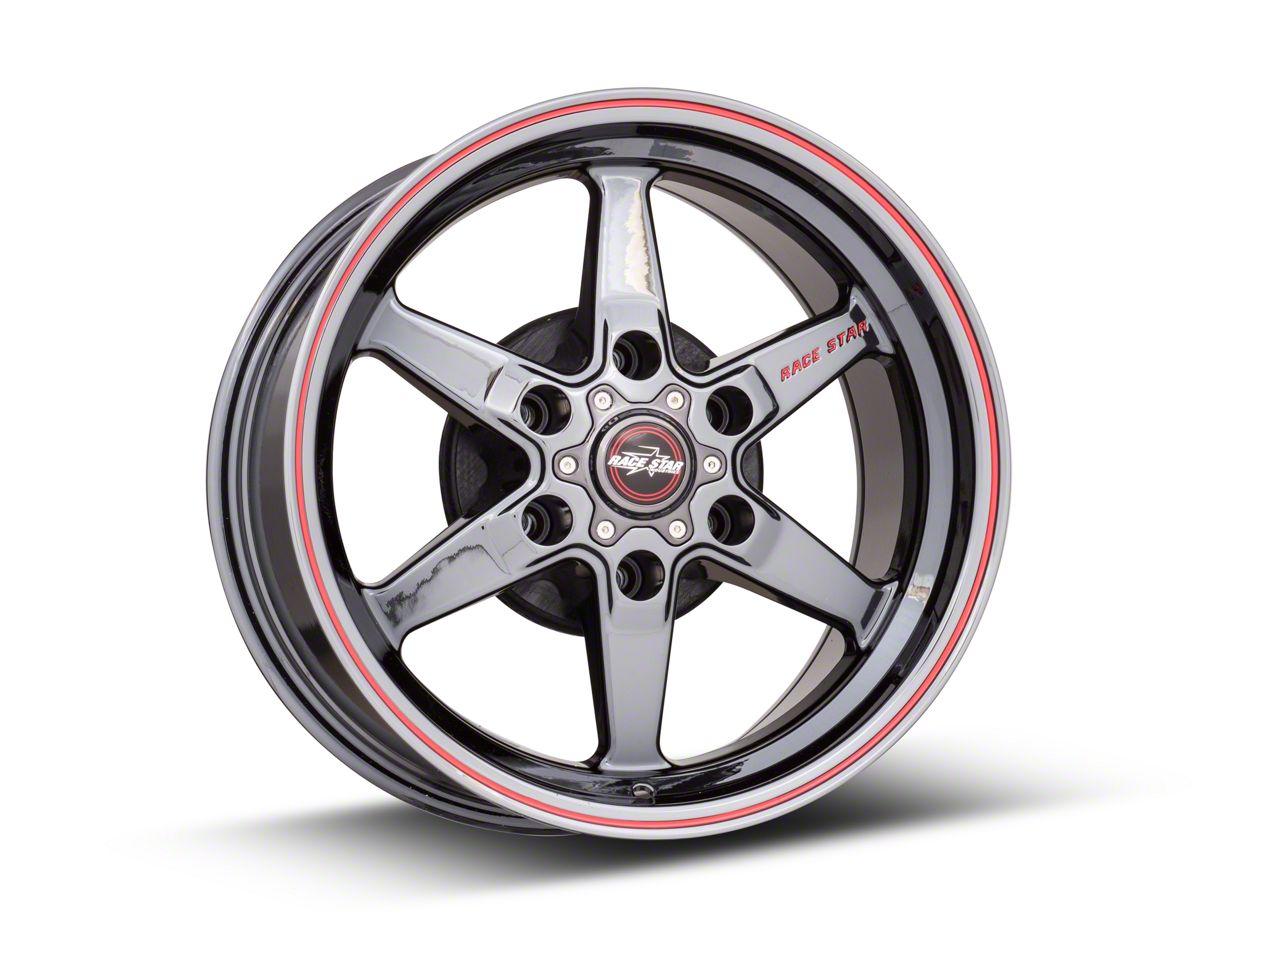 Race Star 93 Truck Star Black Chrome 6-Lug Wheel - 17x9.5 (99-18 Silverado 1500)